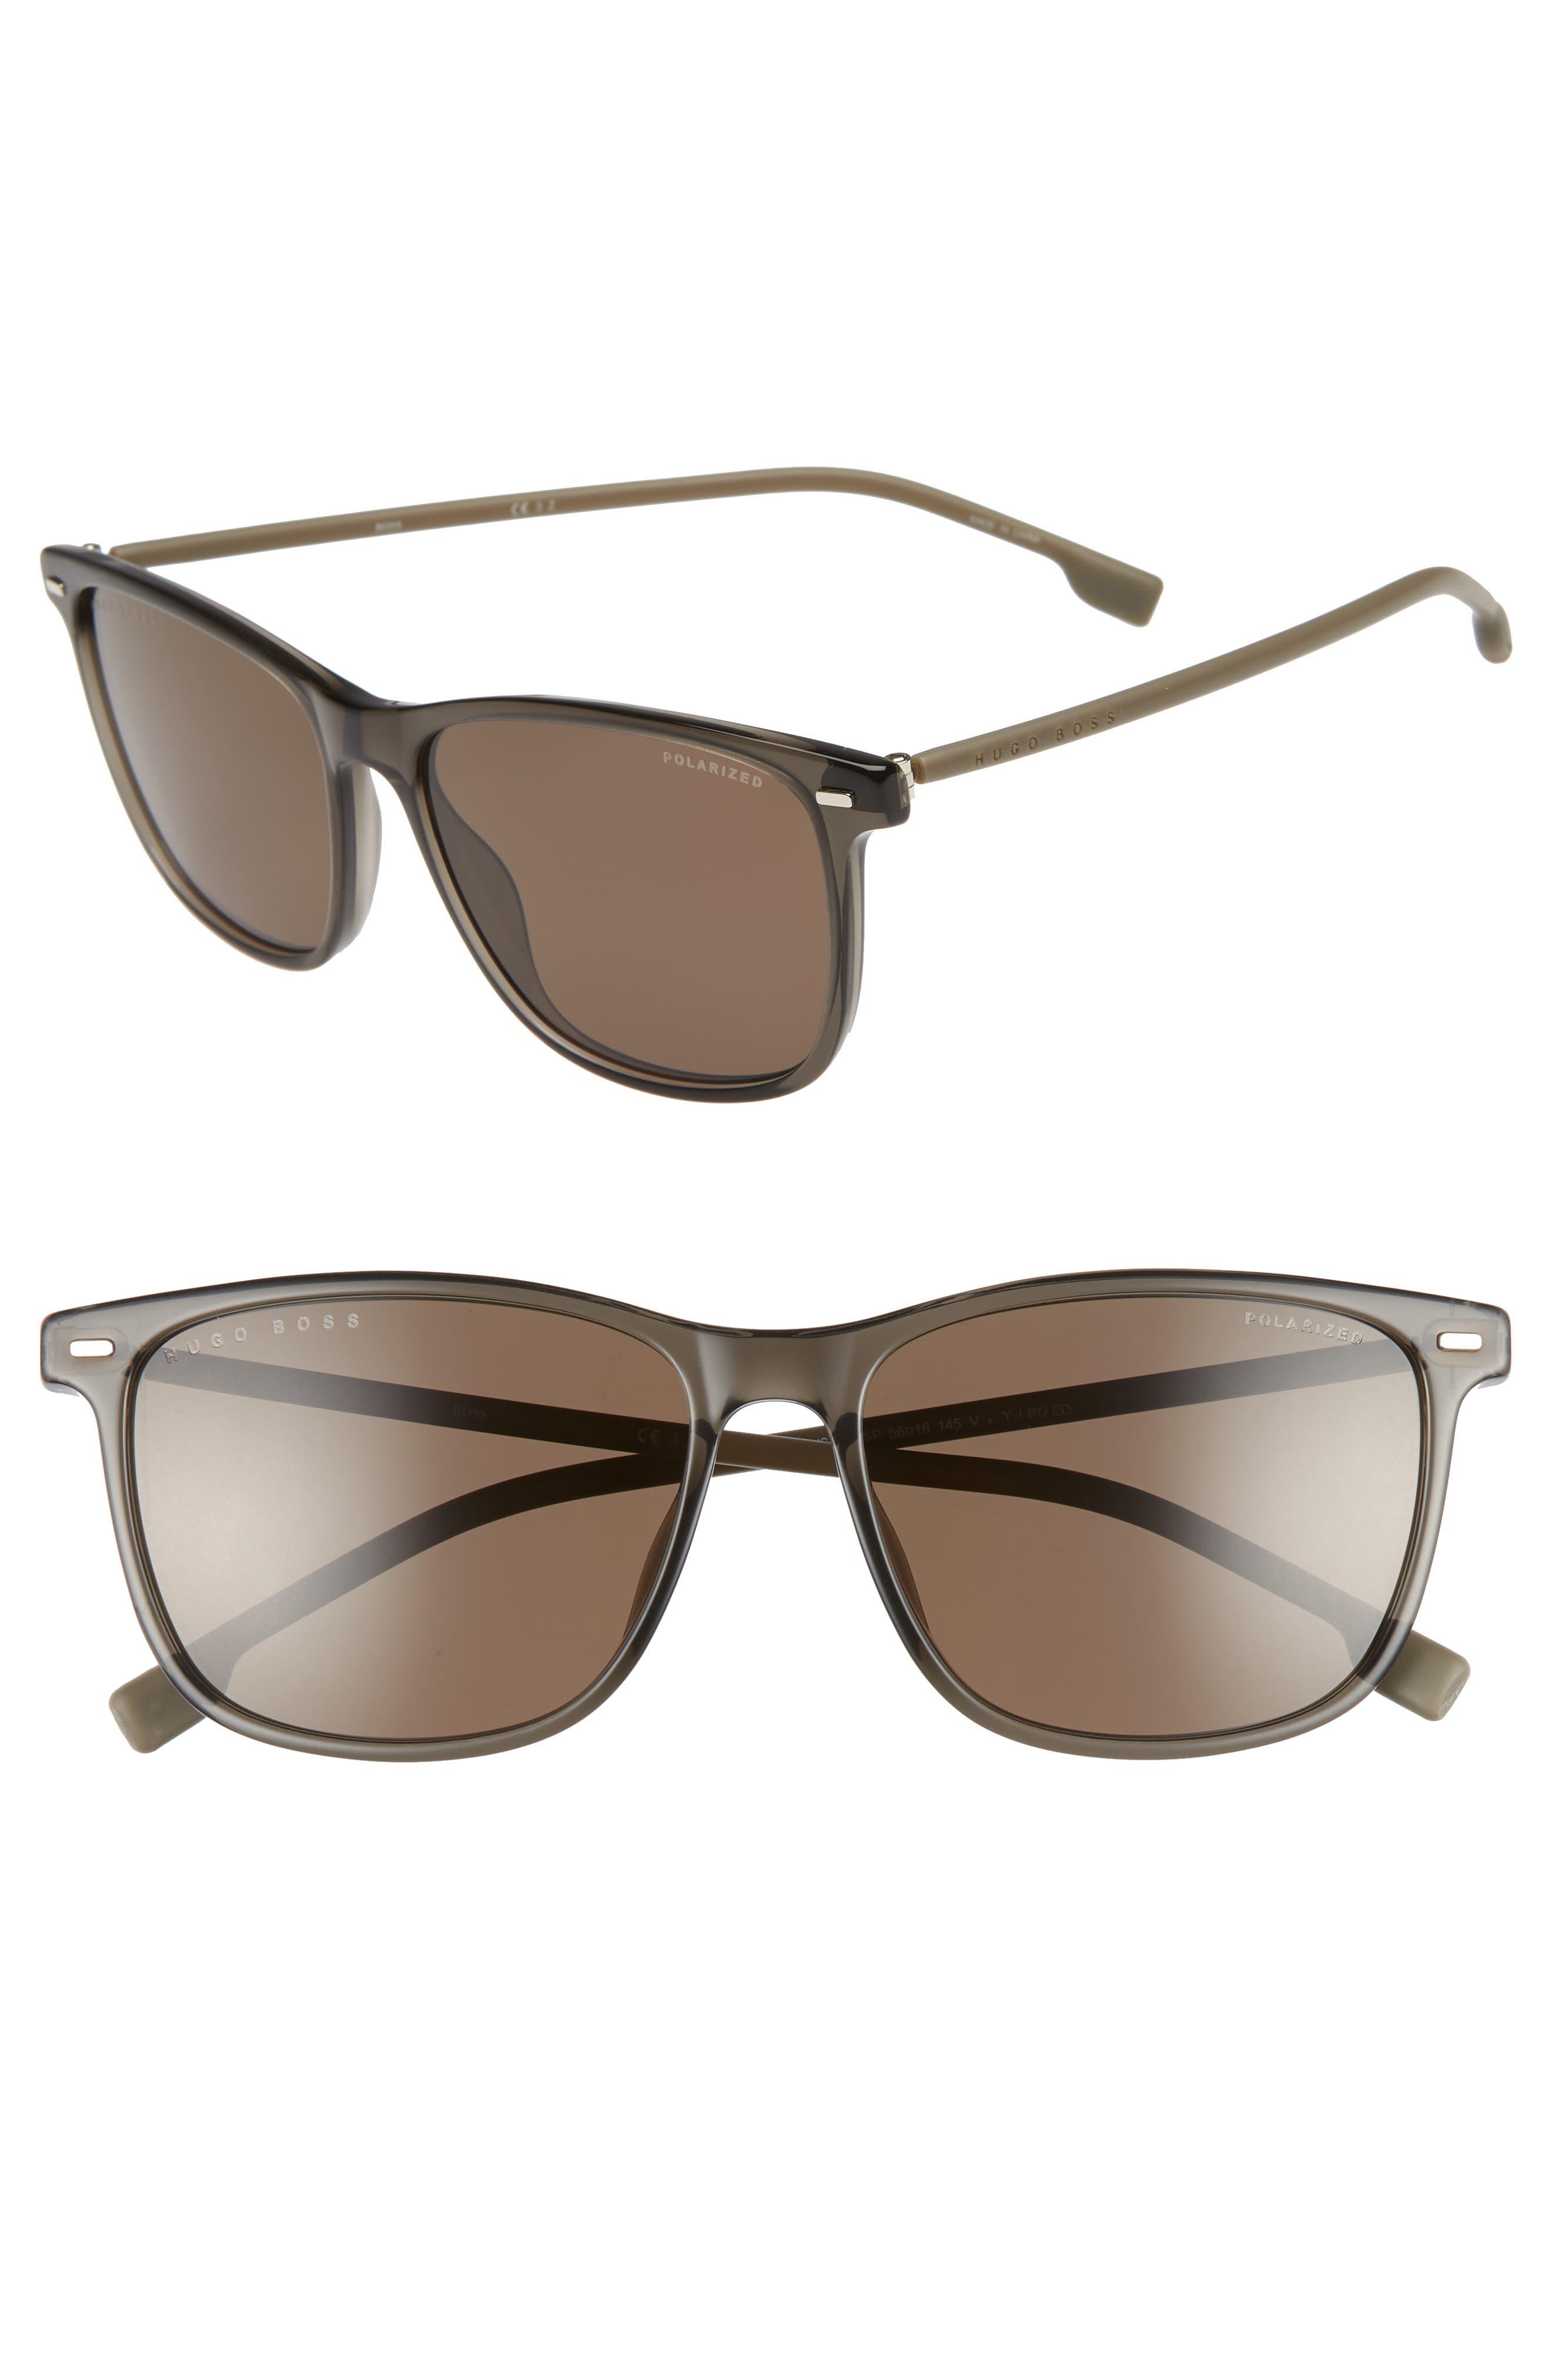 56mm Polarized Sunglasses,                         Main,                         color, GREY BEIGE